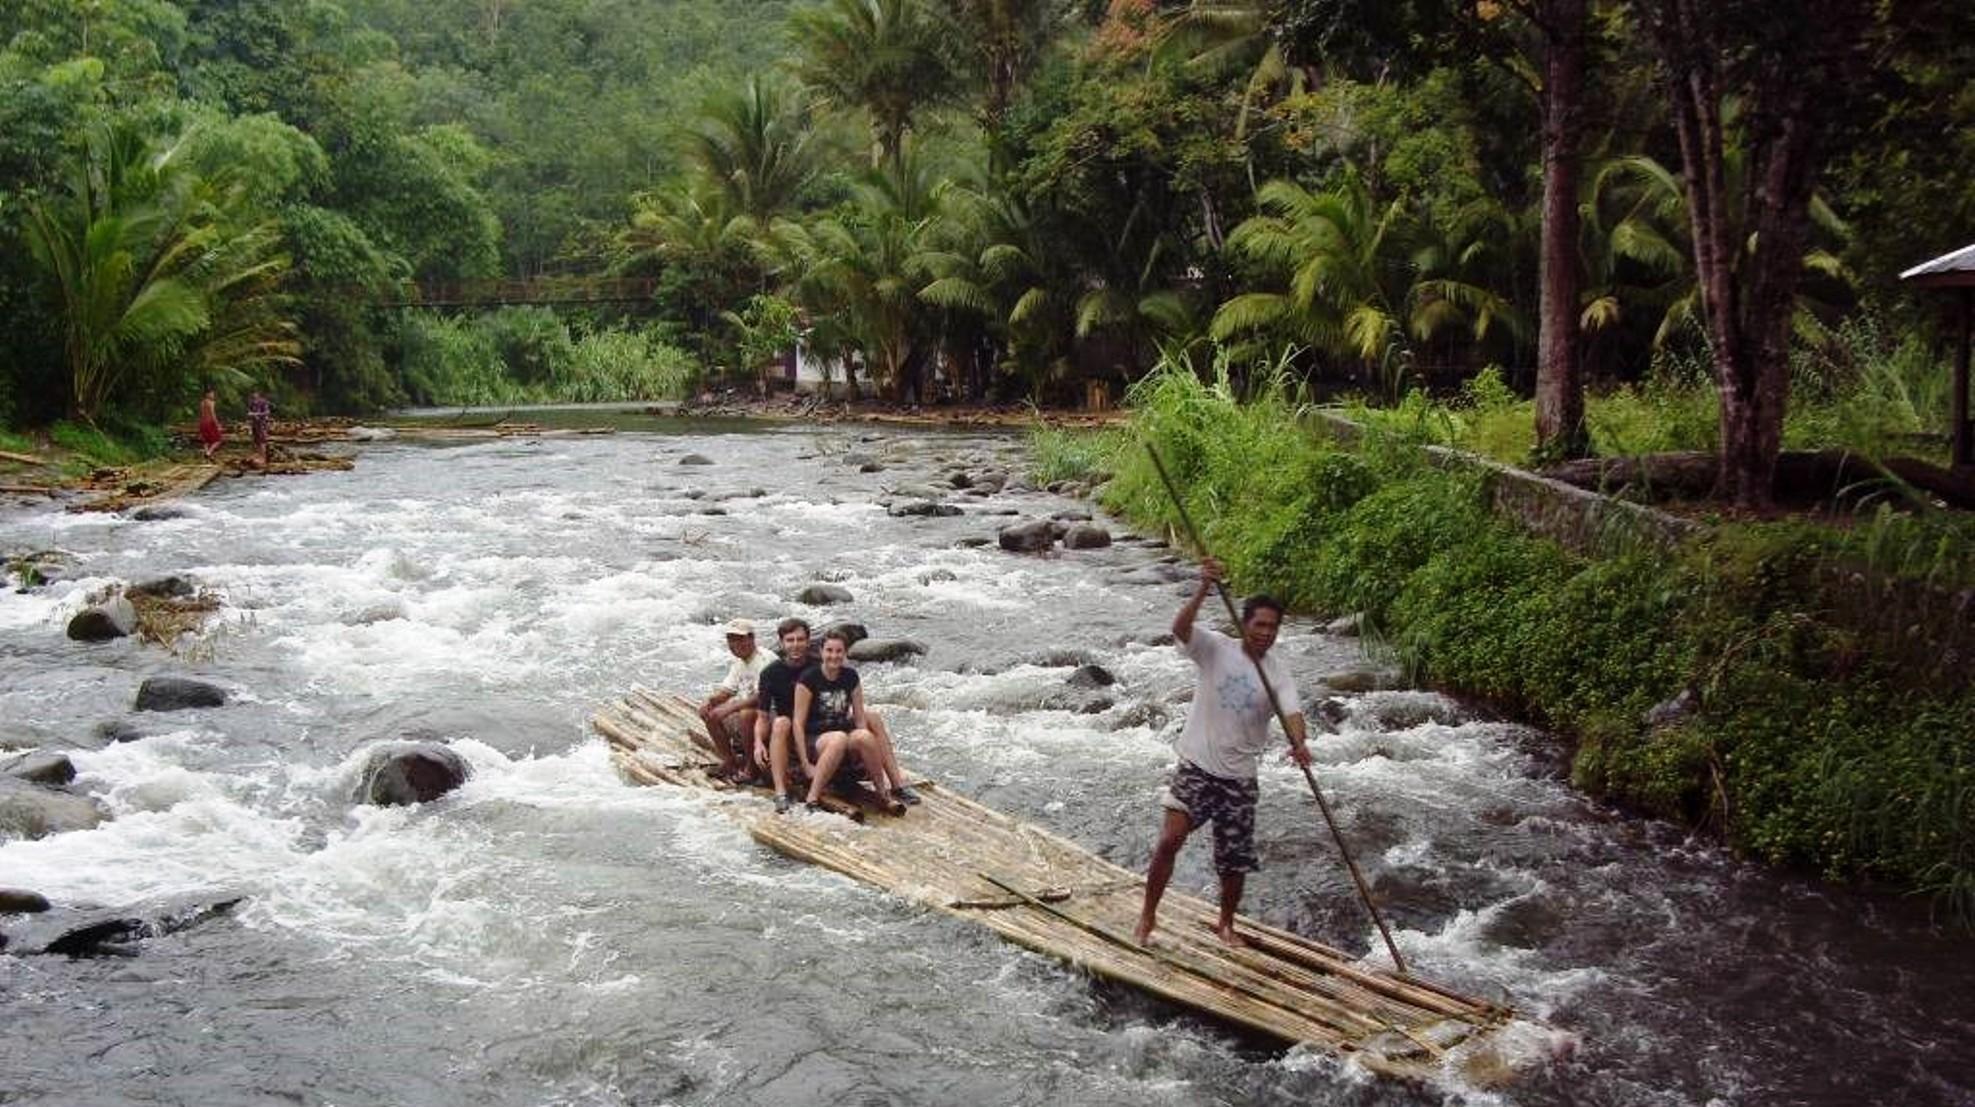 Loksado bamboo raft